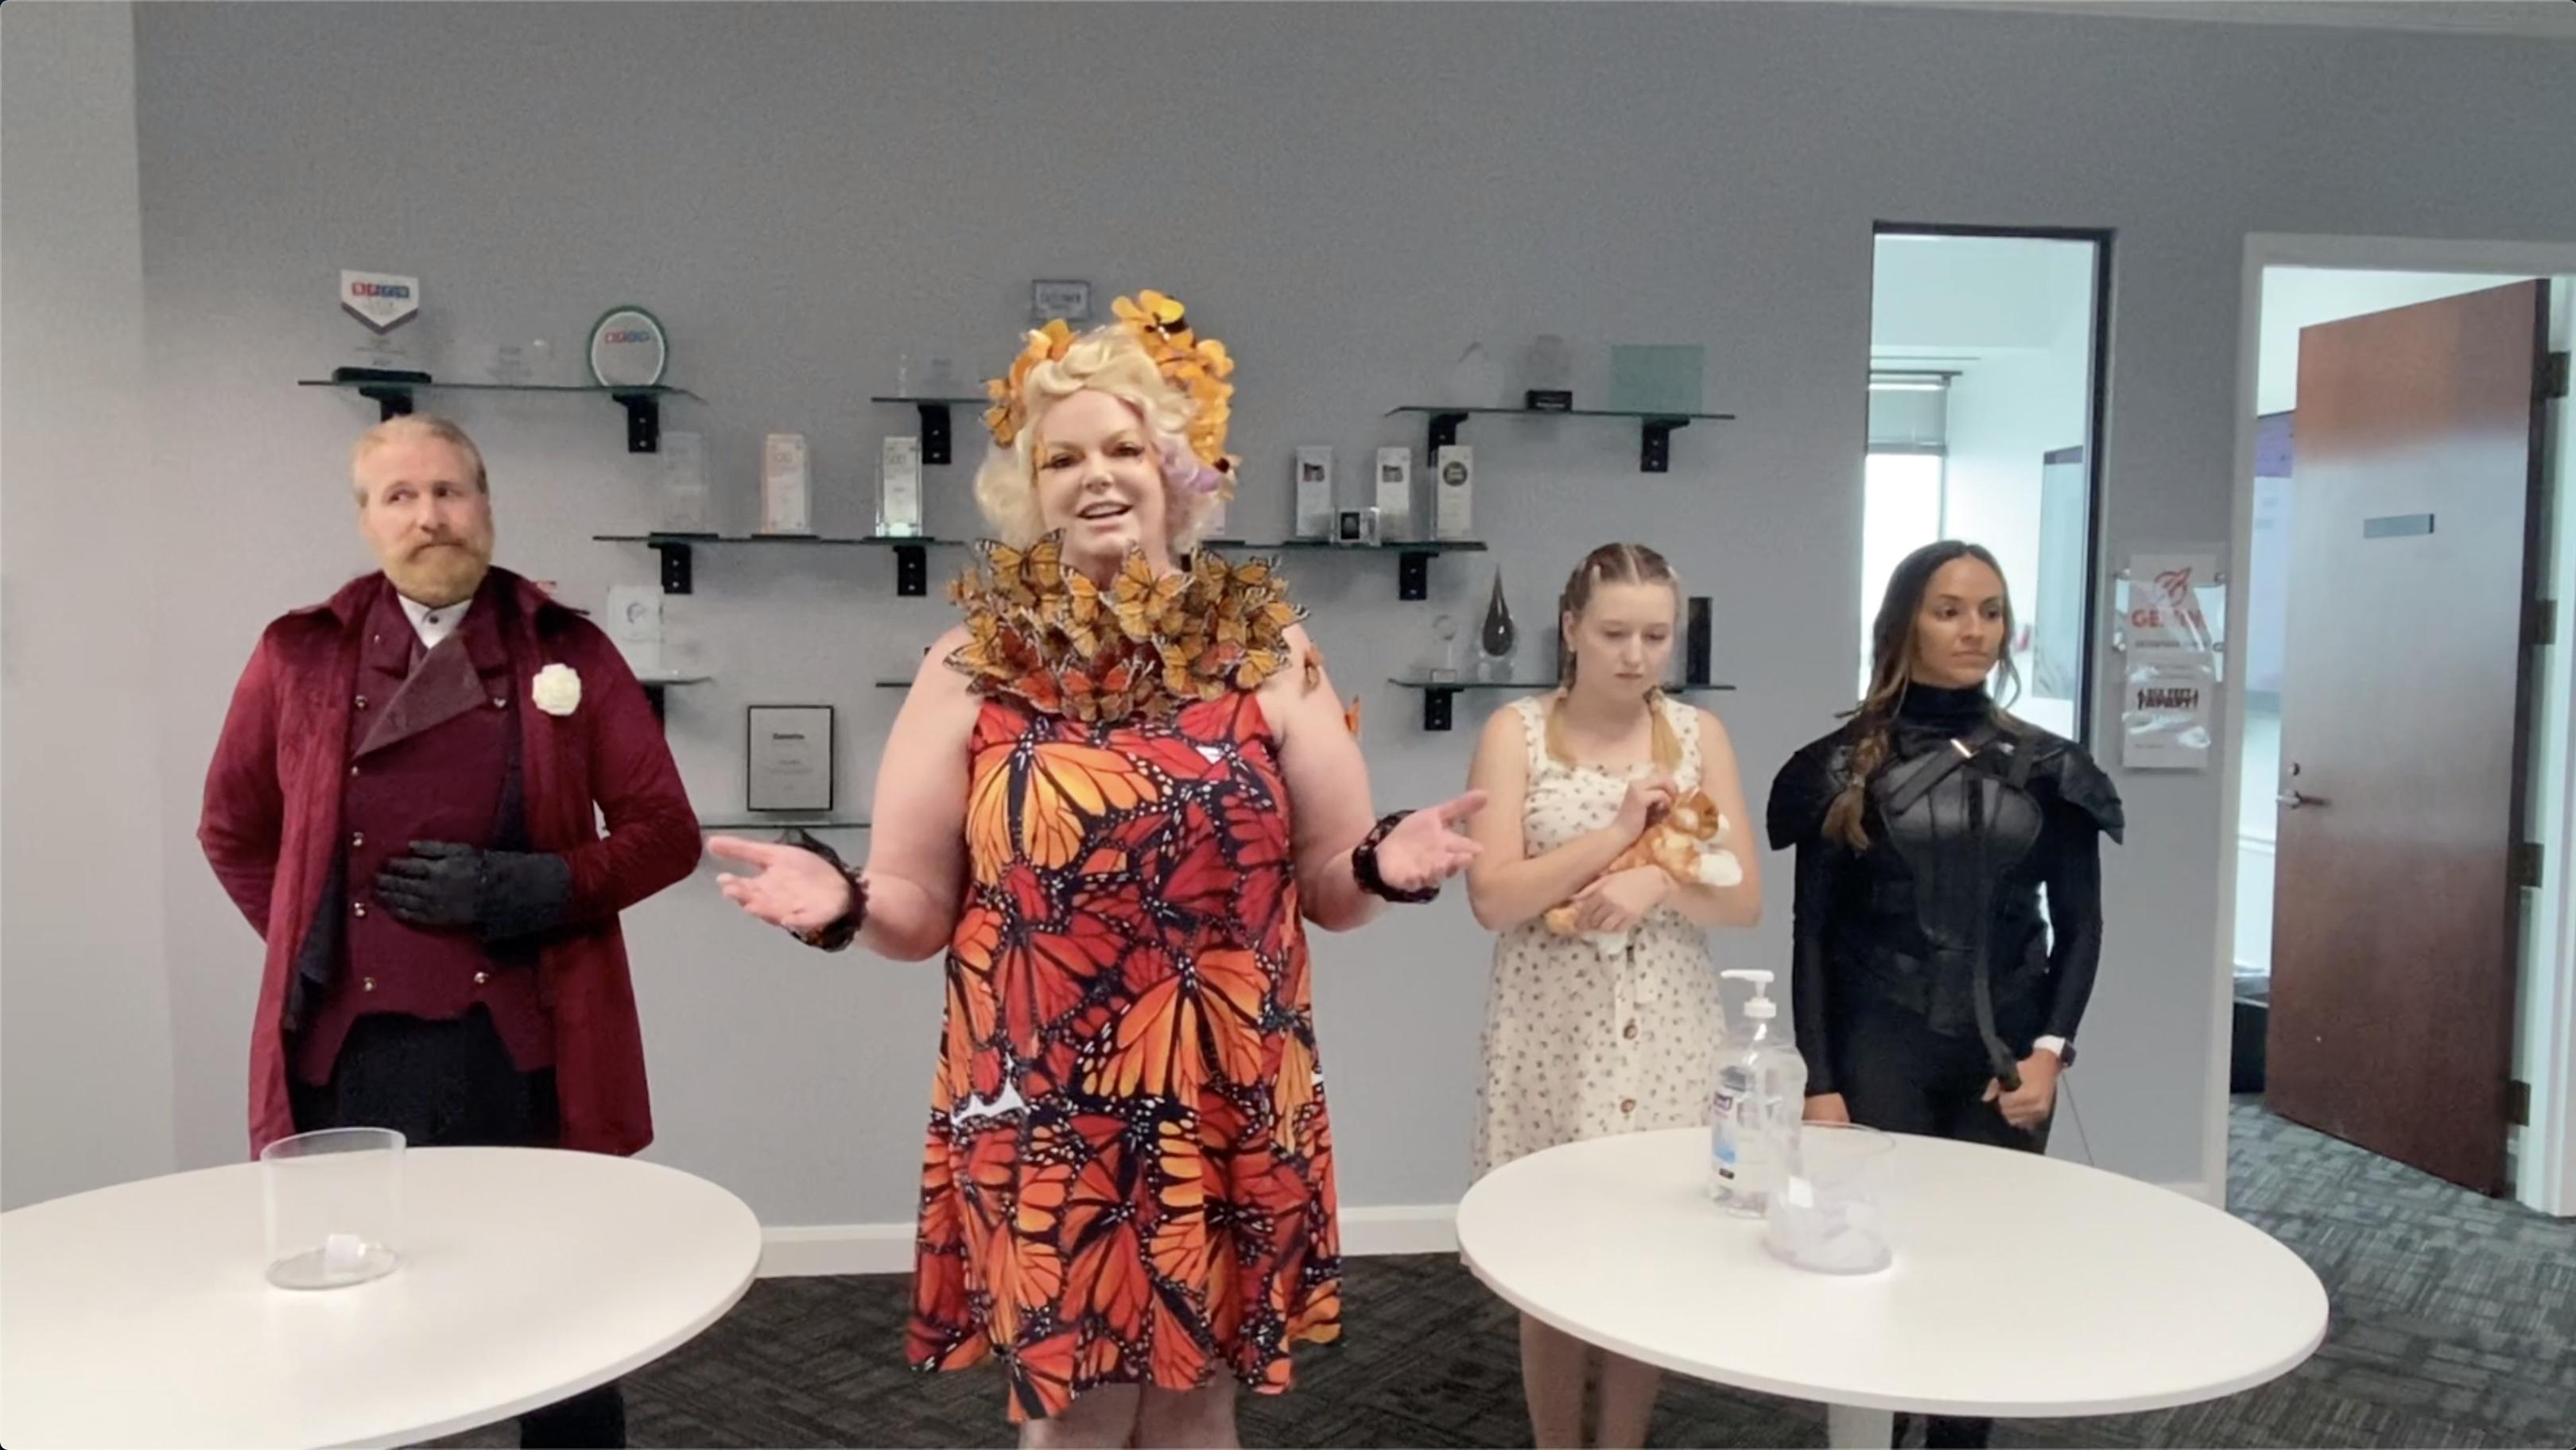 More Virtual Trivia Fun - The Hunger Games Trivia